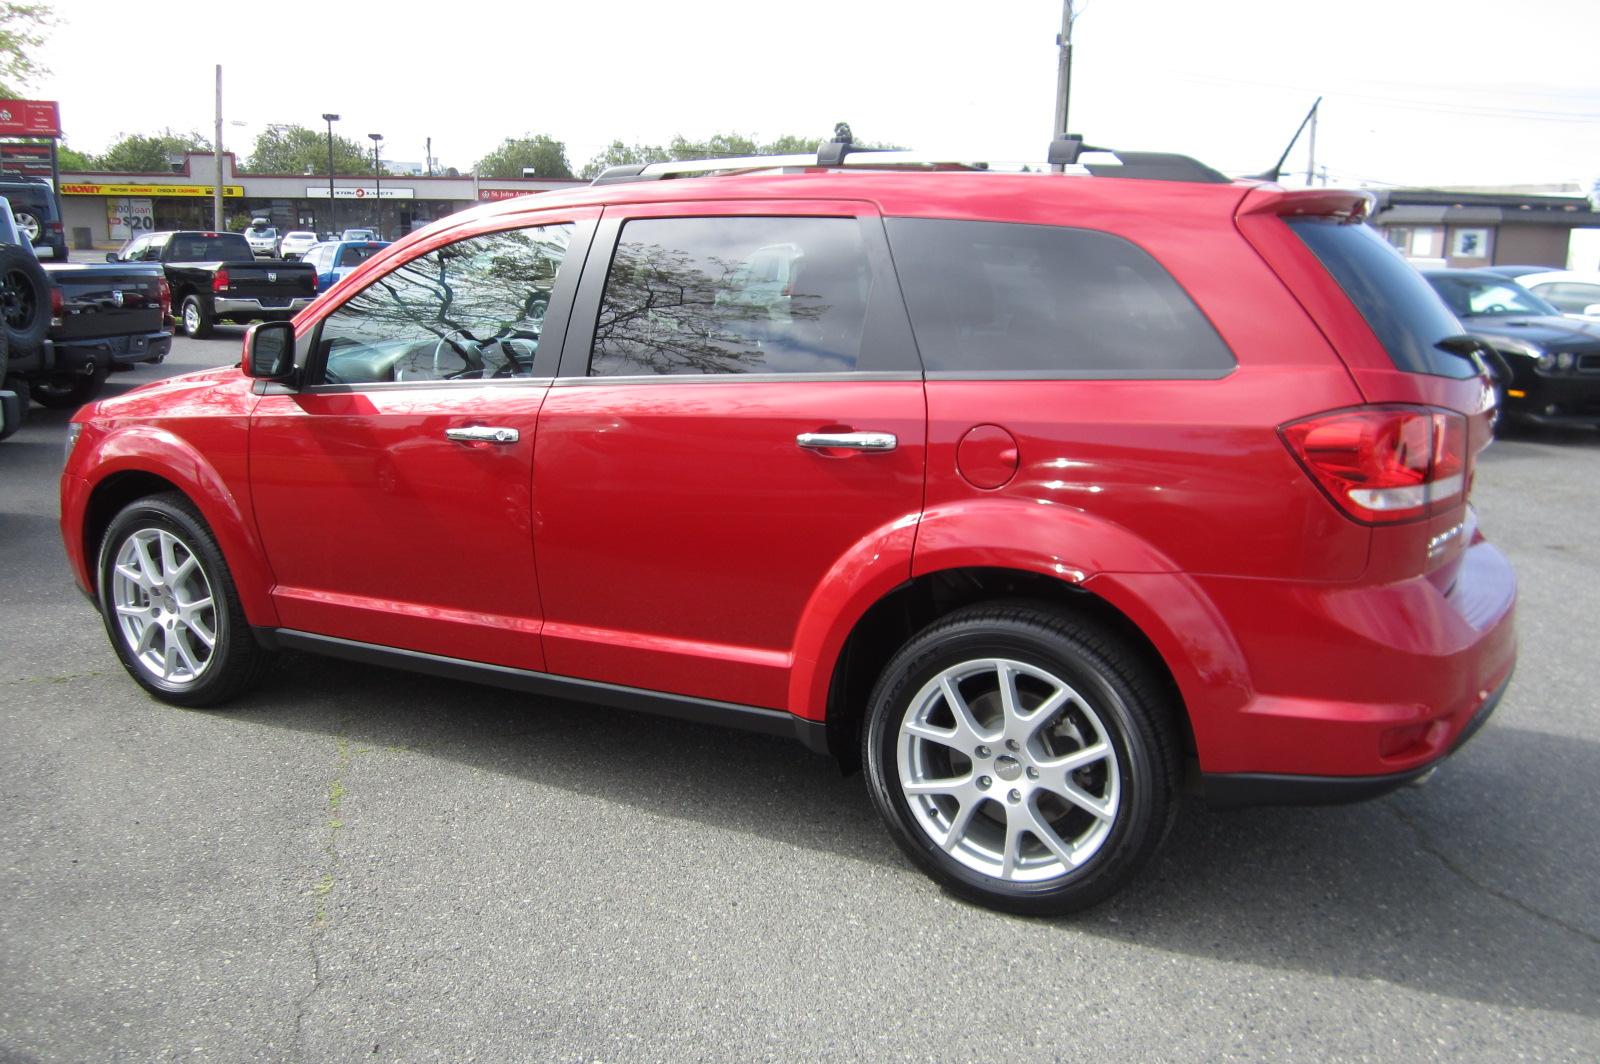 Used 2016 Dodge Journey in Victoria,BC